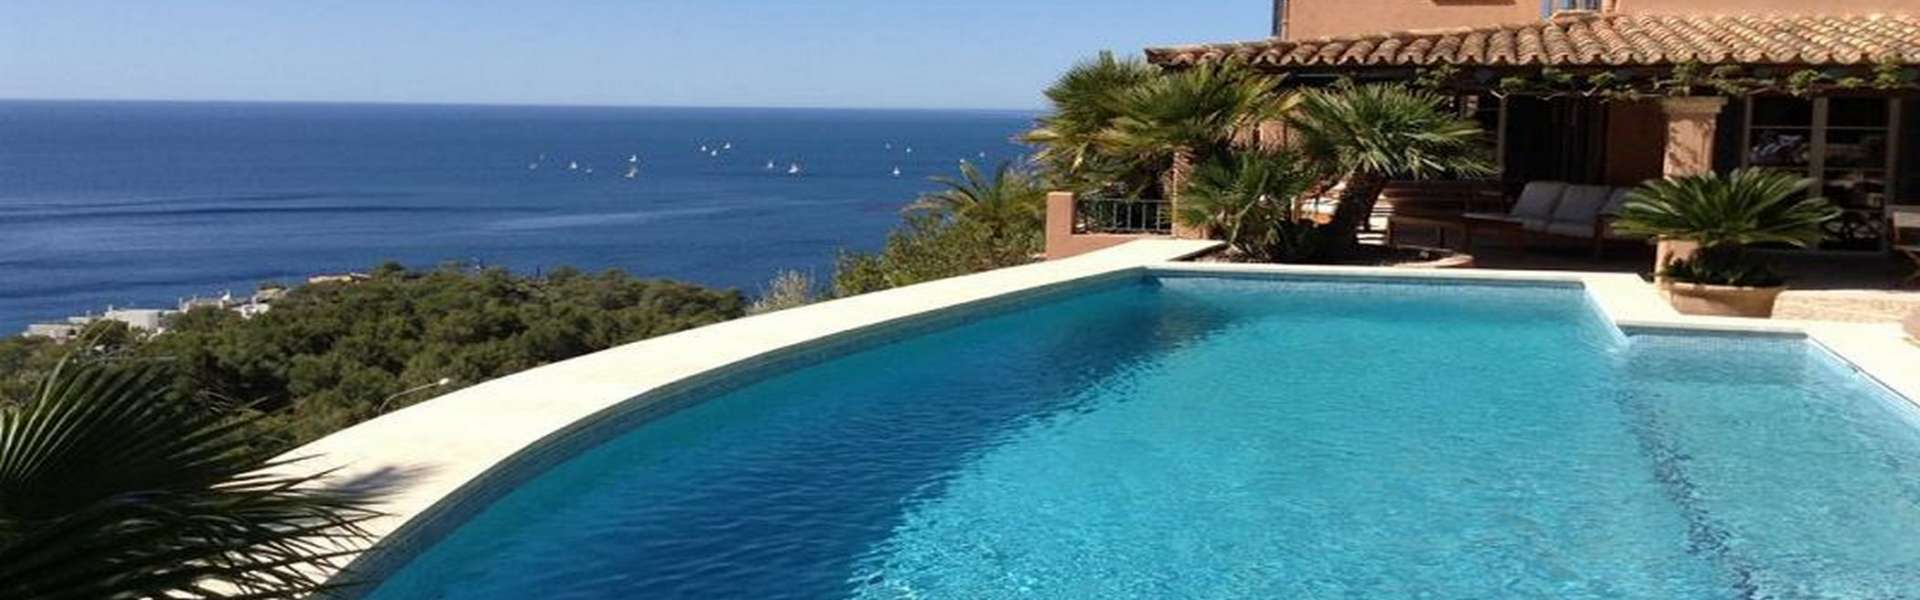 Villa mit Meerblick in Port Andratx zum Verkauf